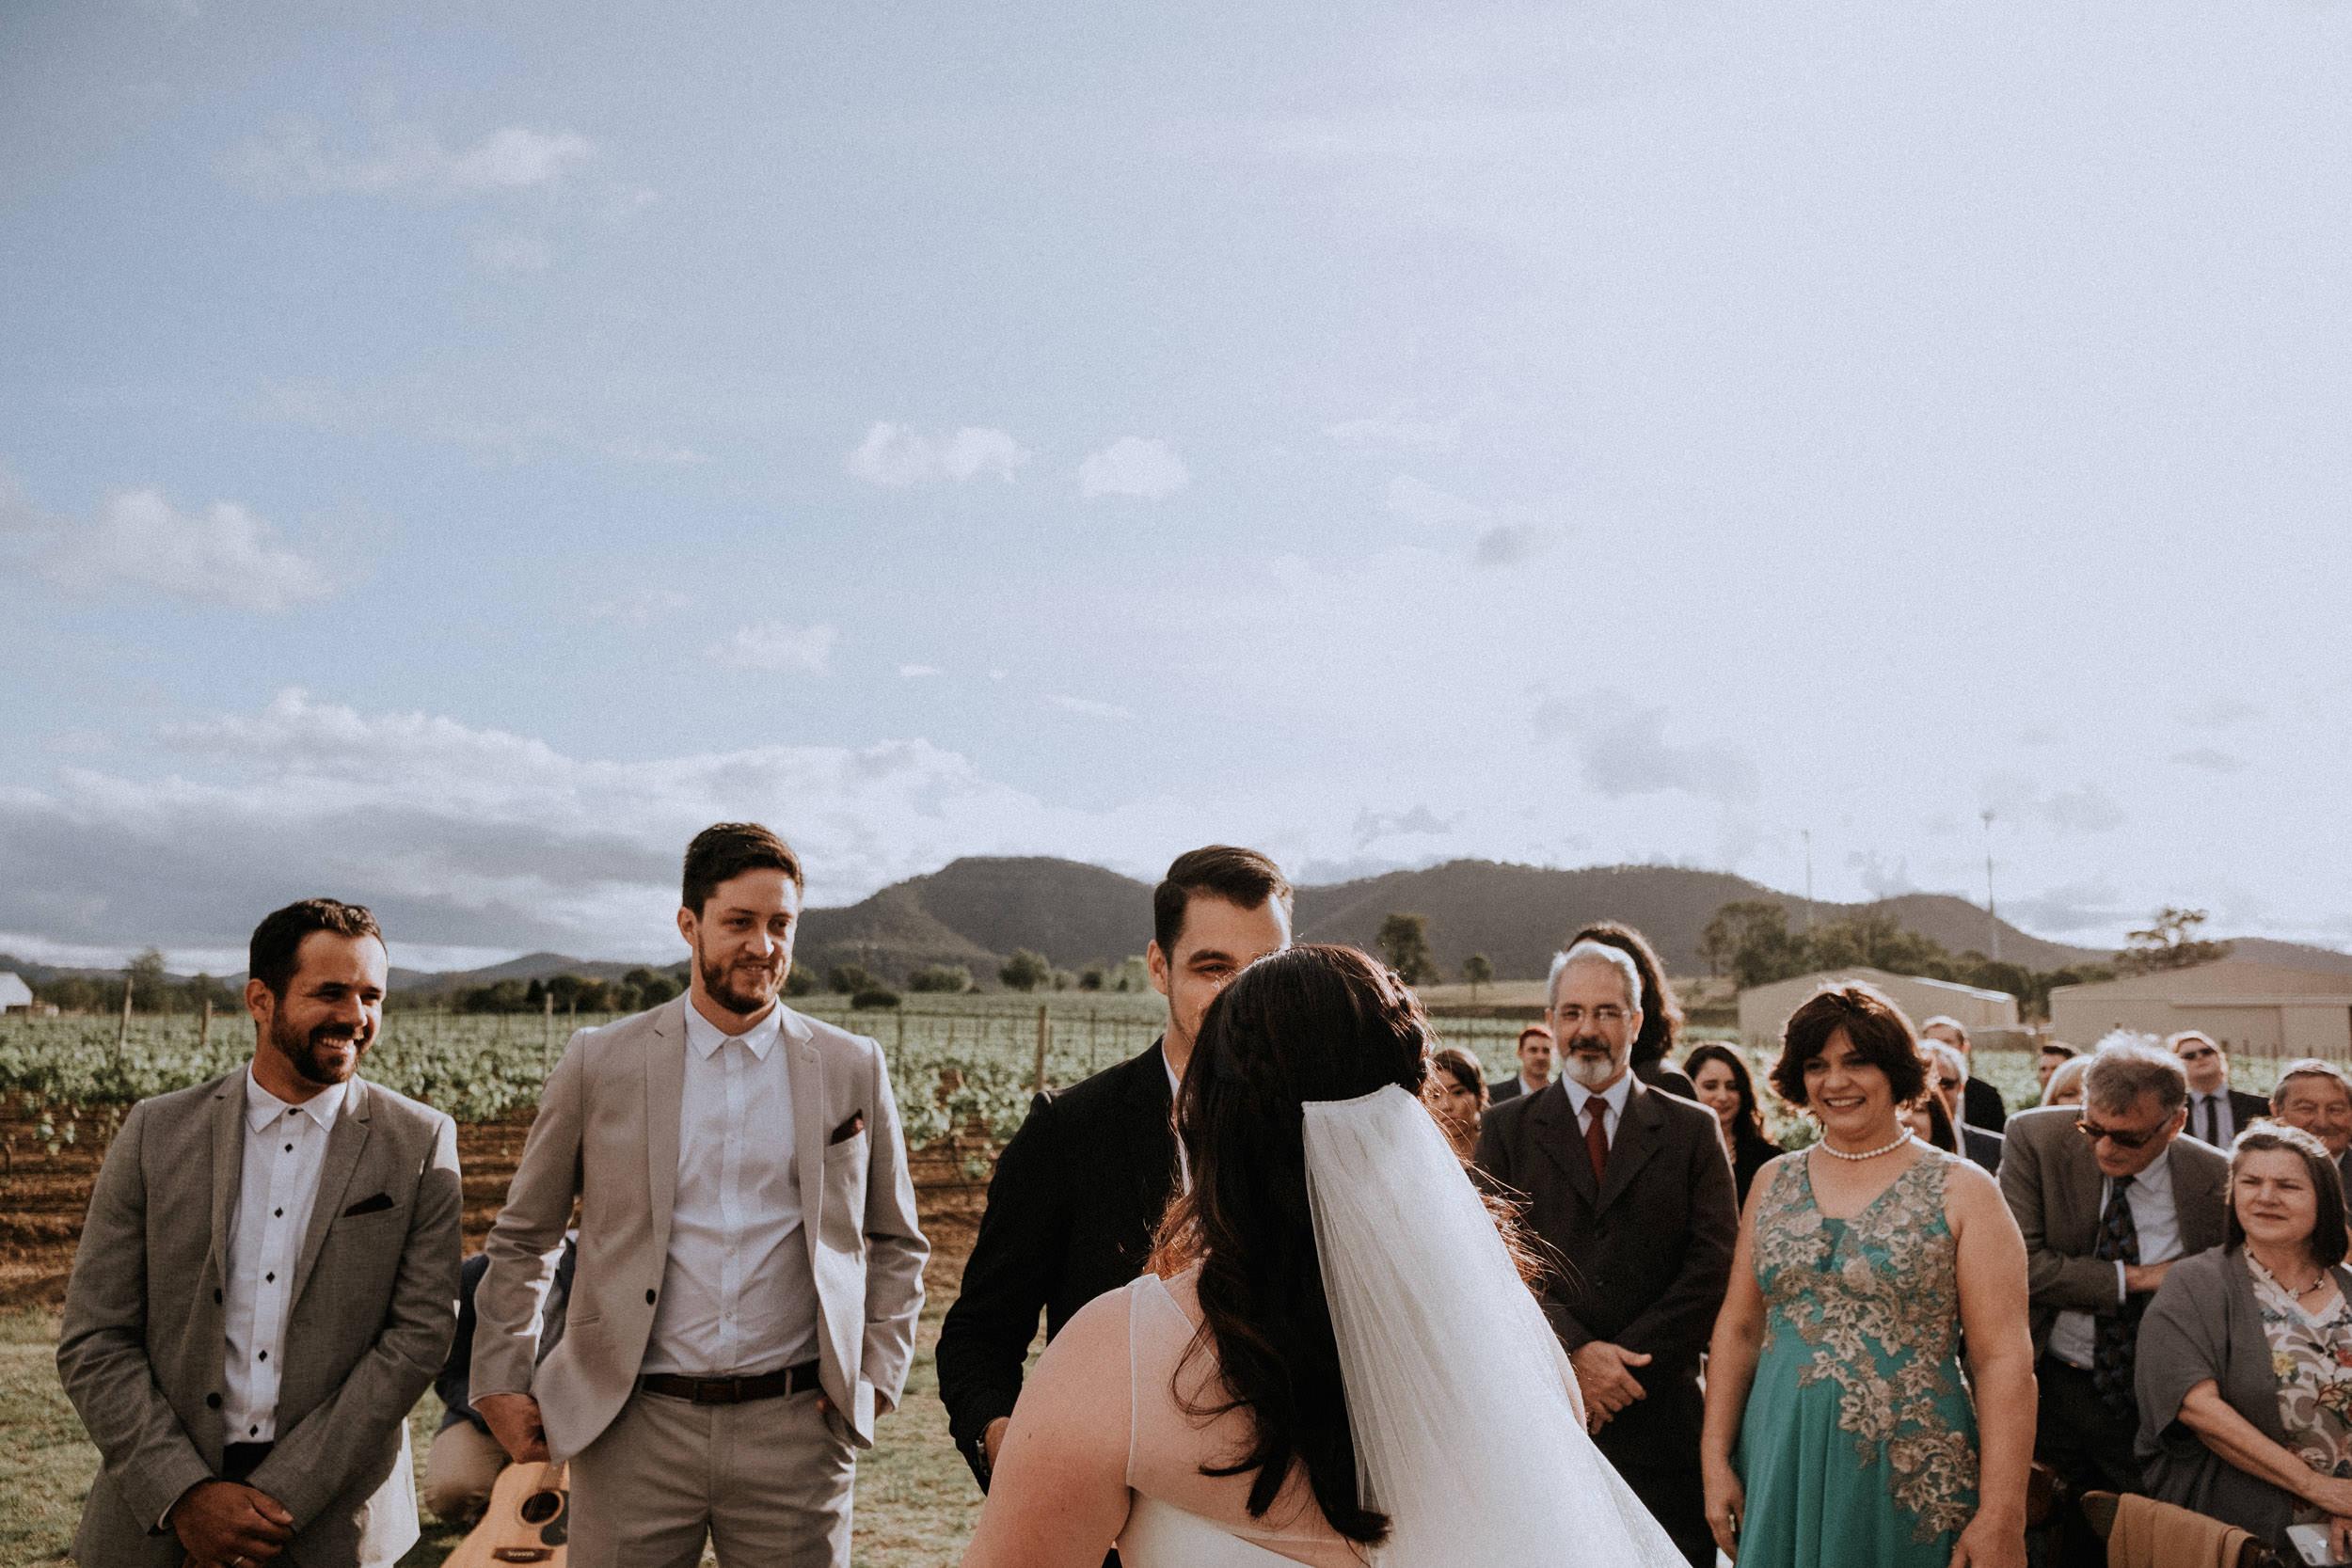 s+j_top_elopement wedding photography_kings & thieves_blog - 218.jpg